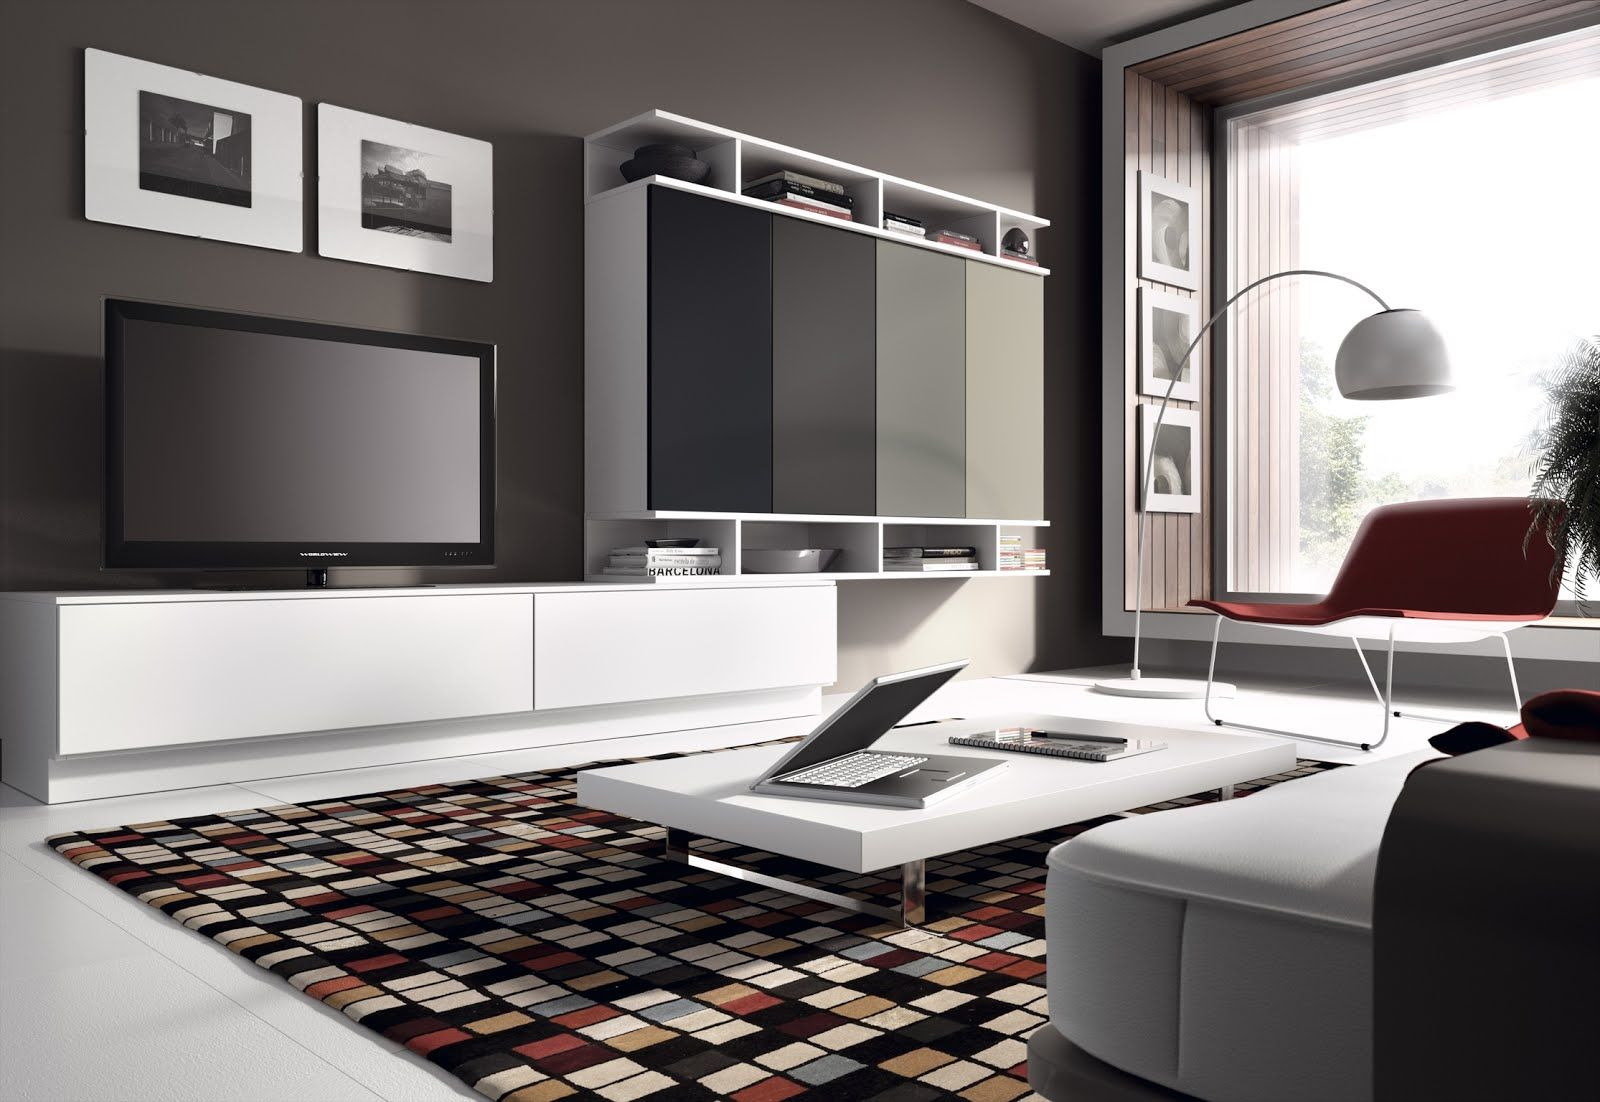 tienda muebles modernosmuebles de salon modernossalones de diseo madrid fotografias de salones modernos diseo - Diseo De Salones